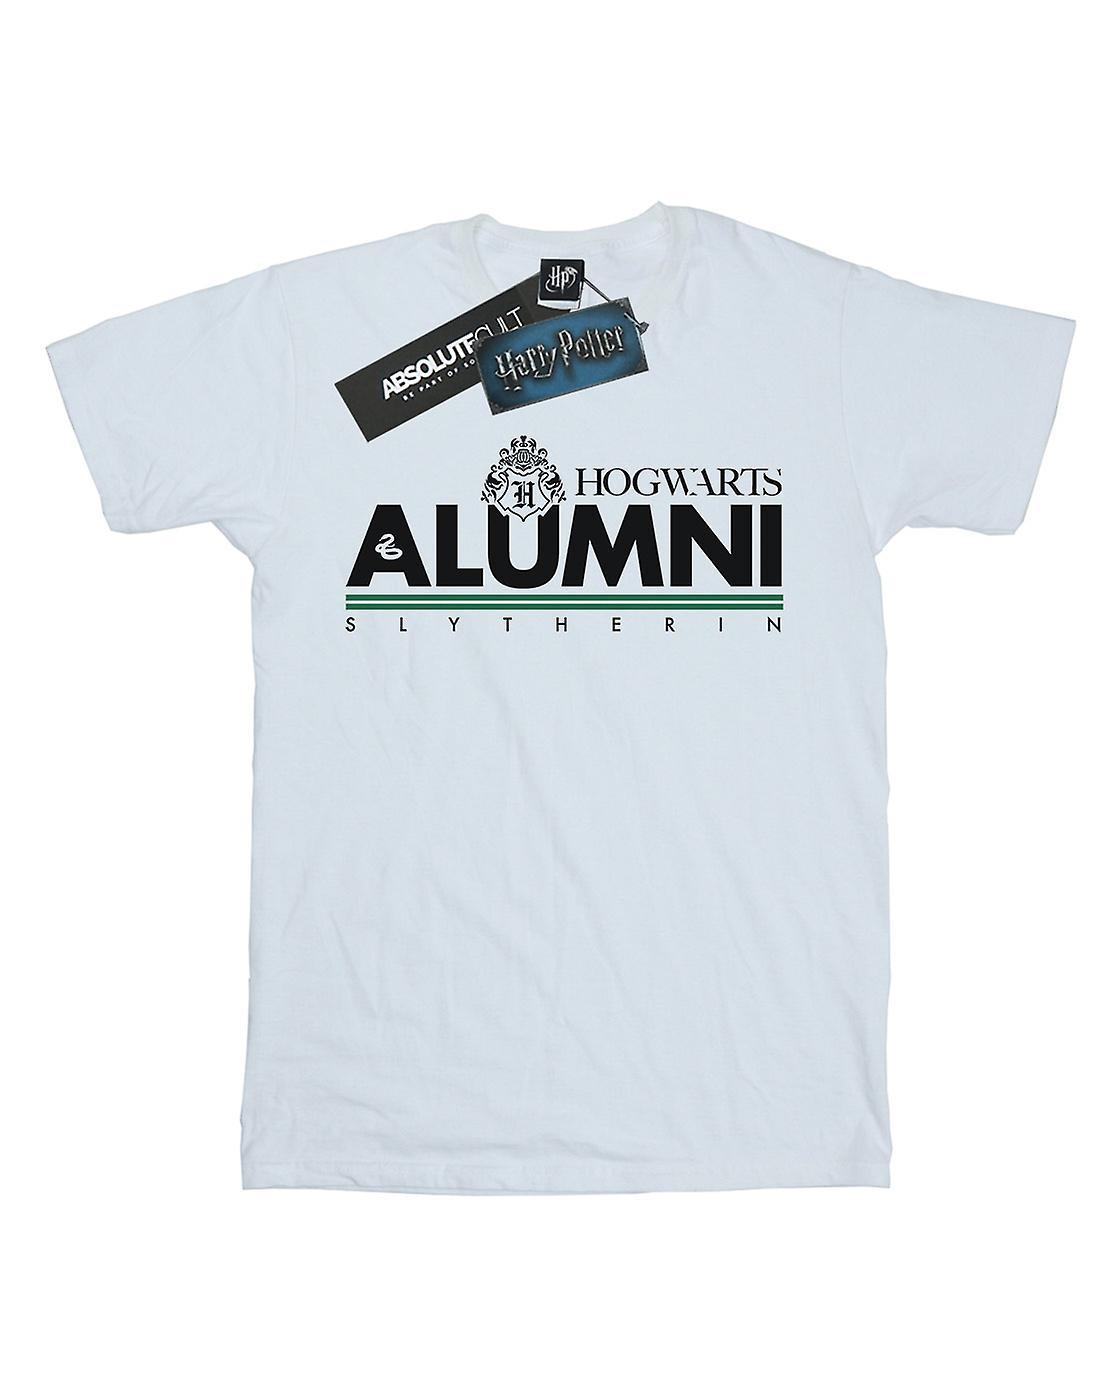 Harry Potter Girls Hogwarts Alumni Slytherin T-Shirt